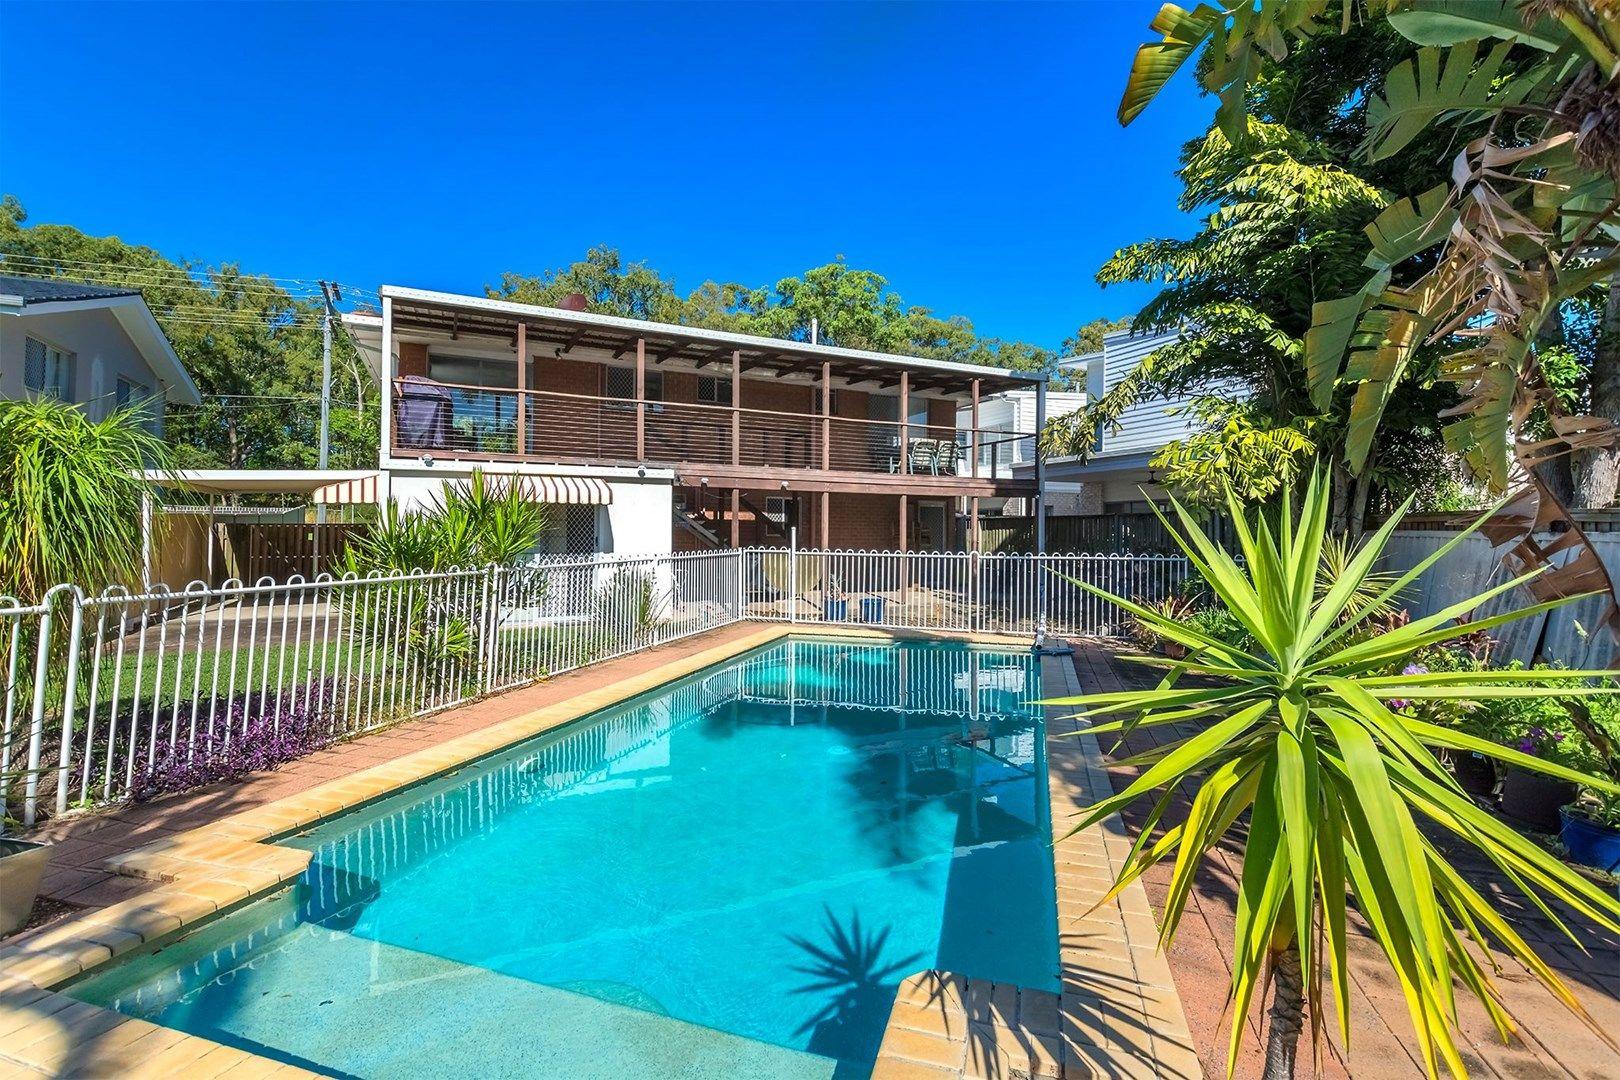 49 Kitchener Street, Tugun QLD 4224 - House For Sale   Domain